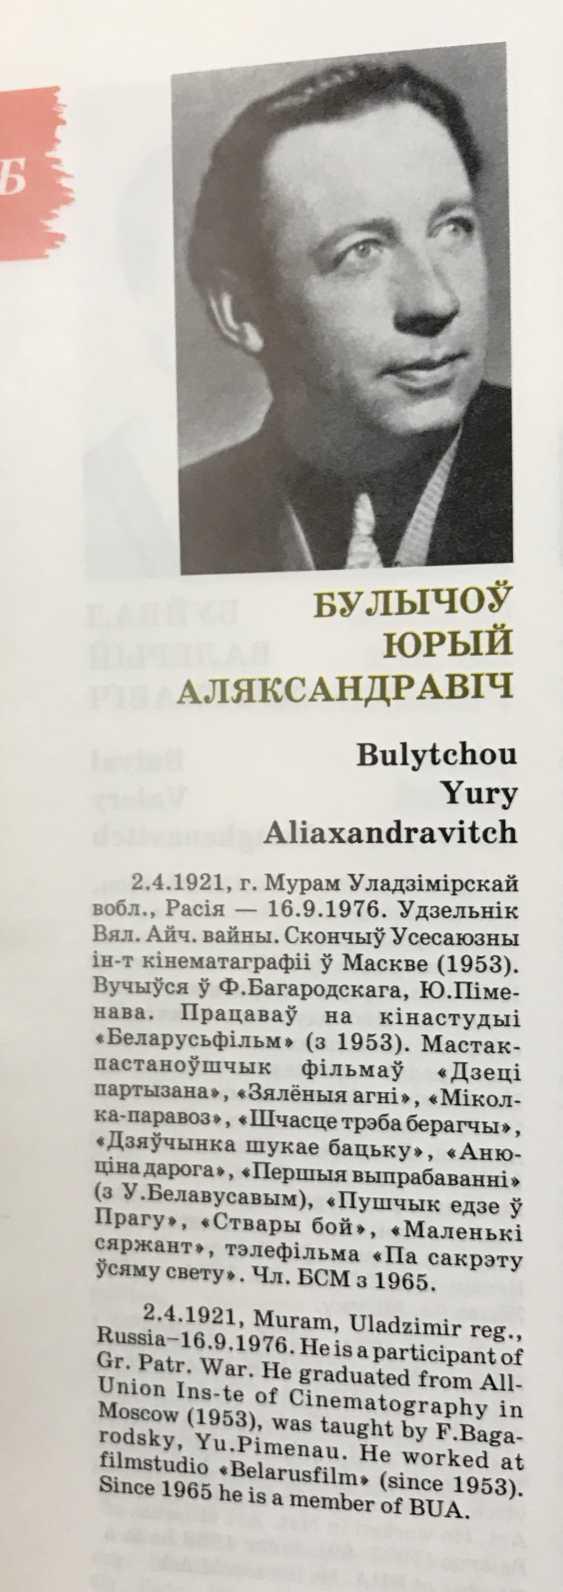 Bulychev Yu. a. Sevastopol, 1972 - photo 5